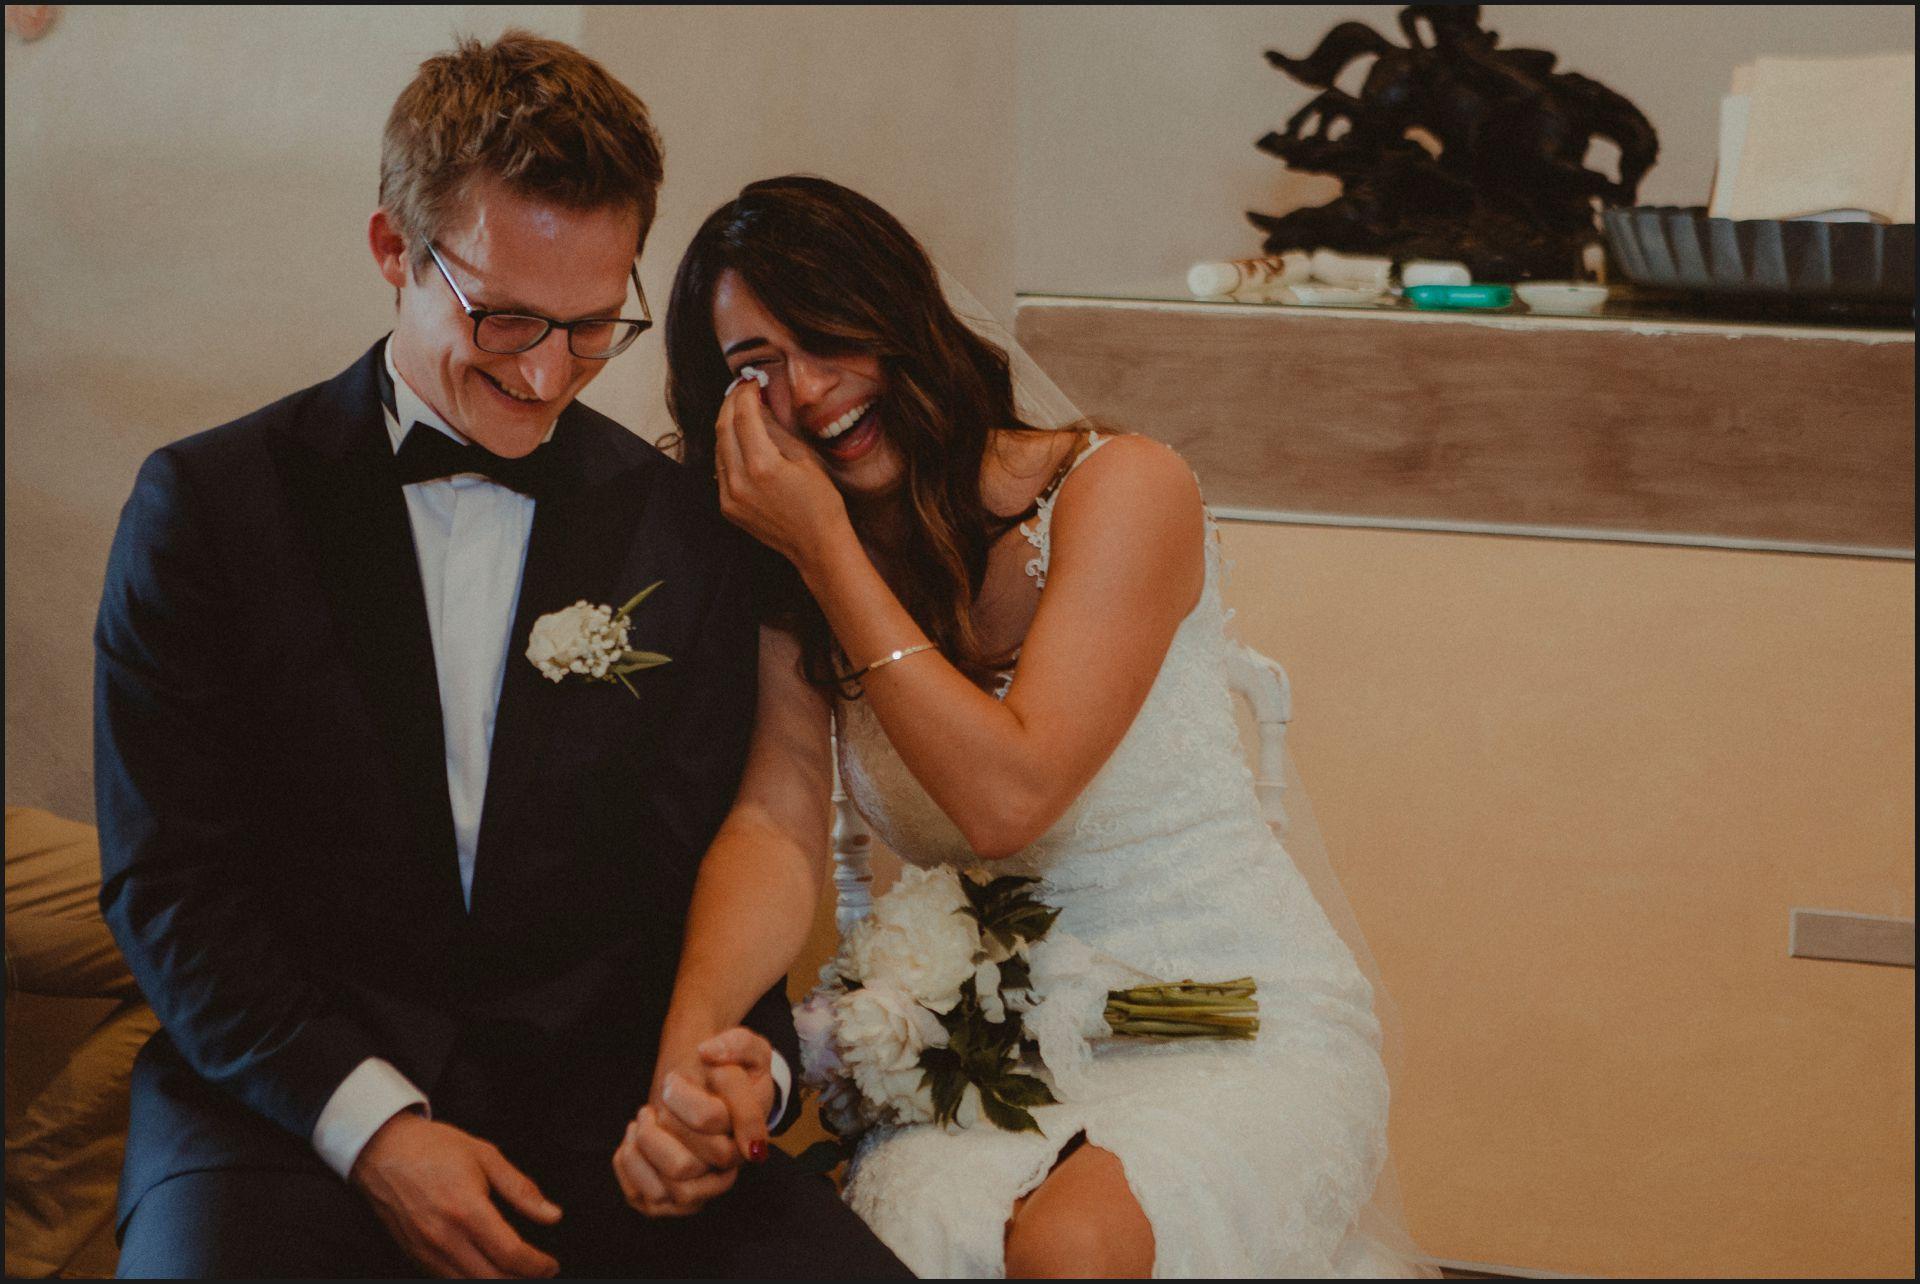 wedding, symbolic ceremony, wedding, umbria, nikis resort, bride, groom, cry, smile